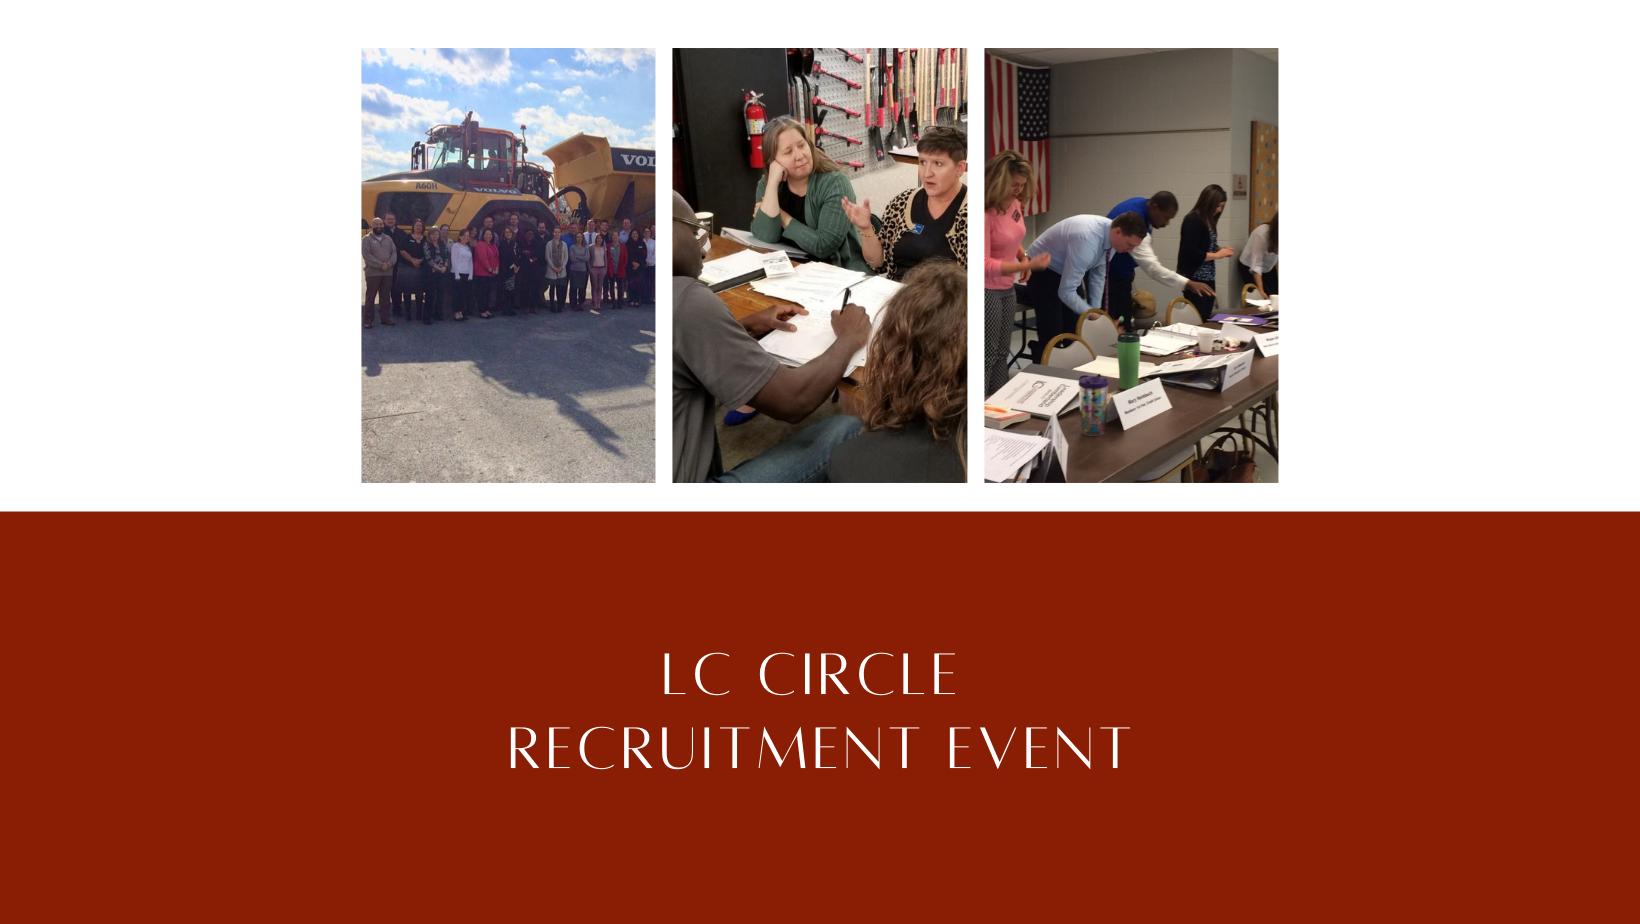 LC Circle: Recruitment Event